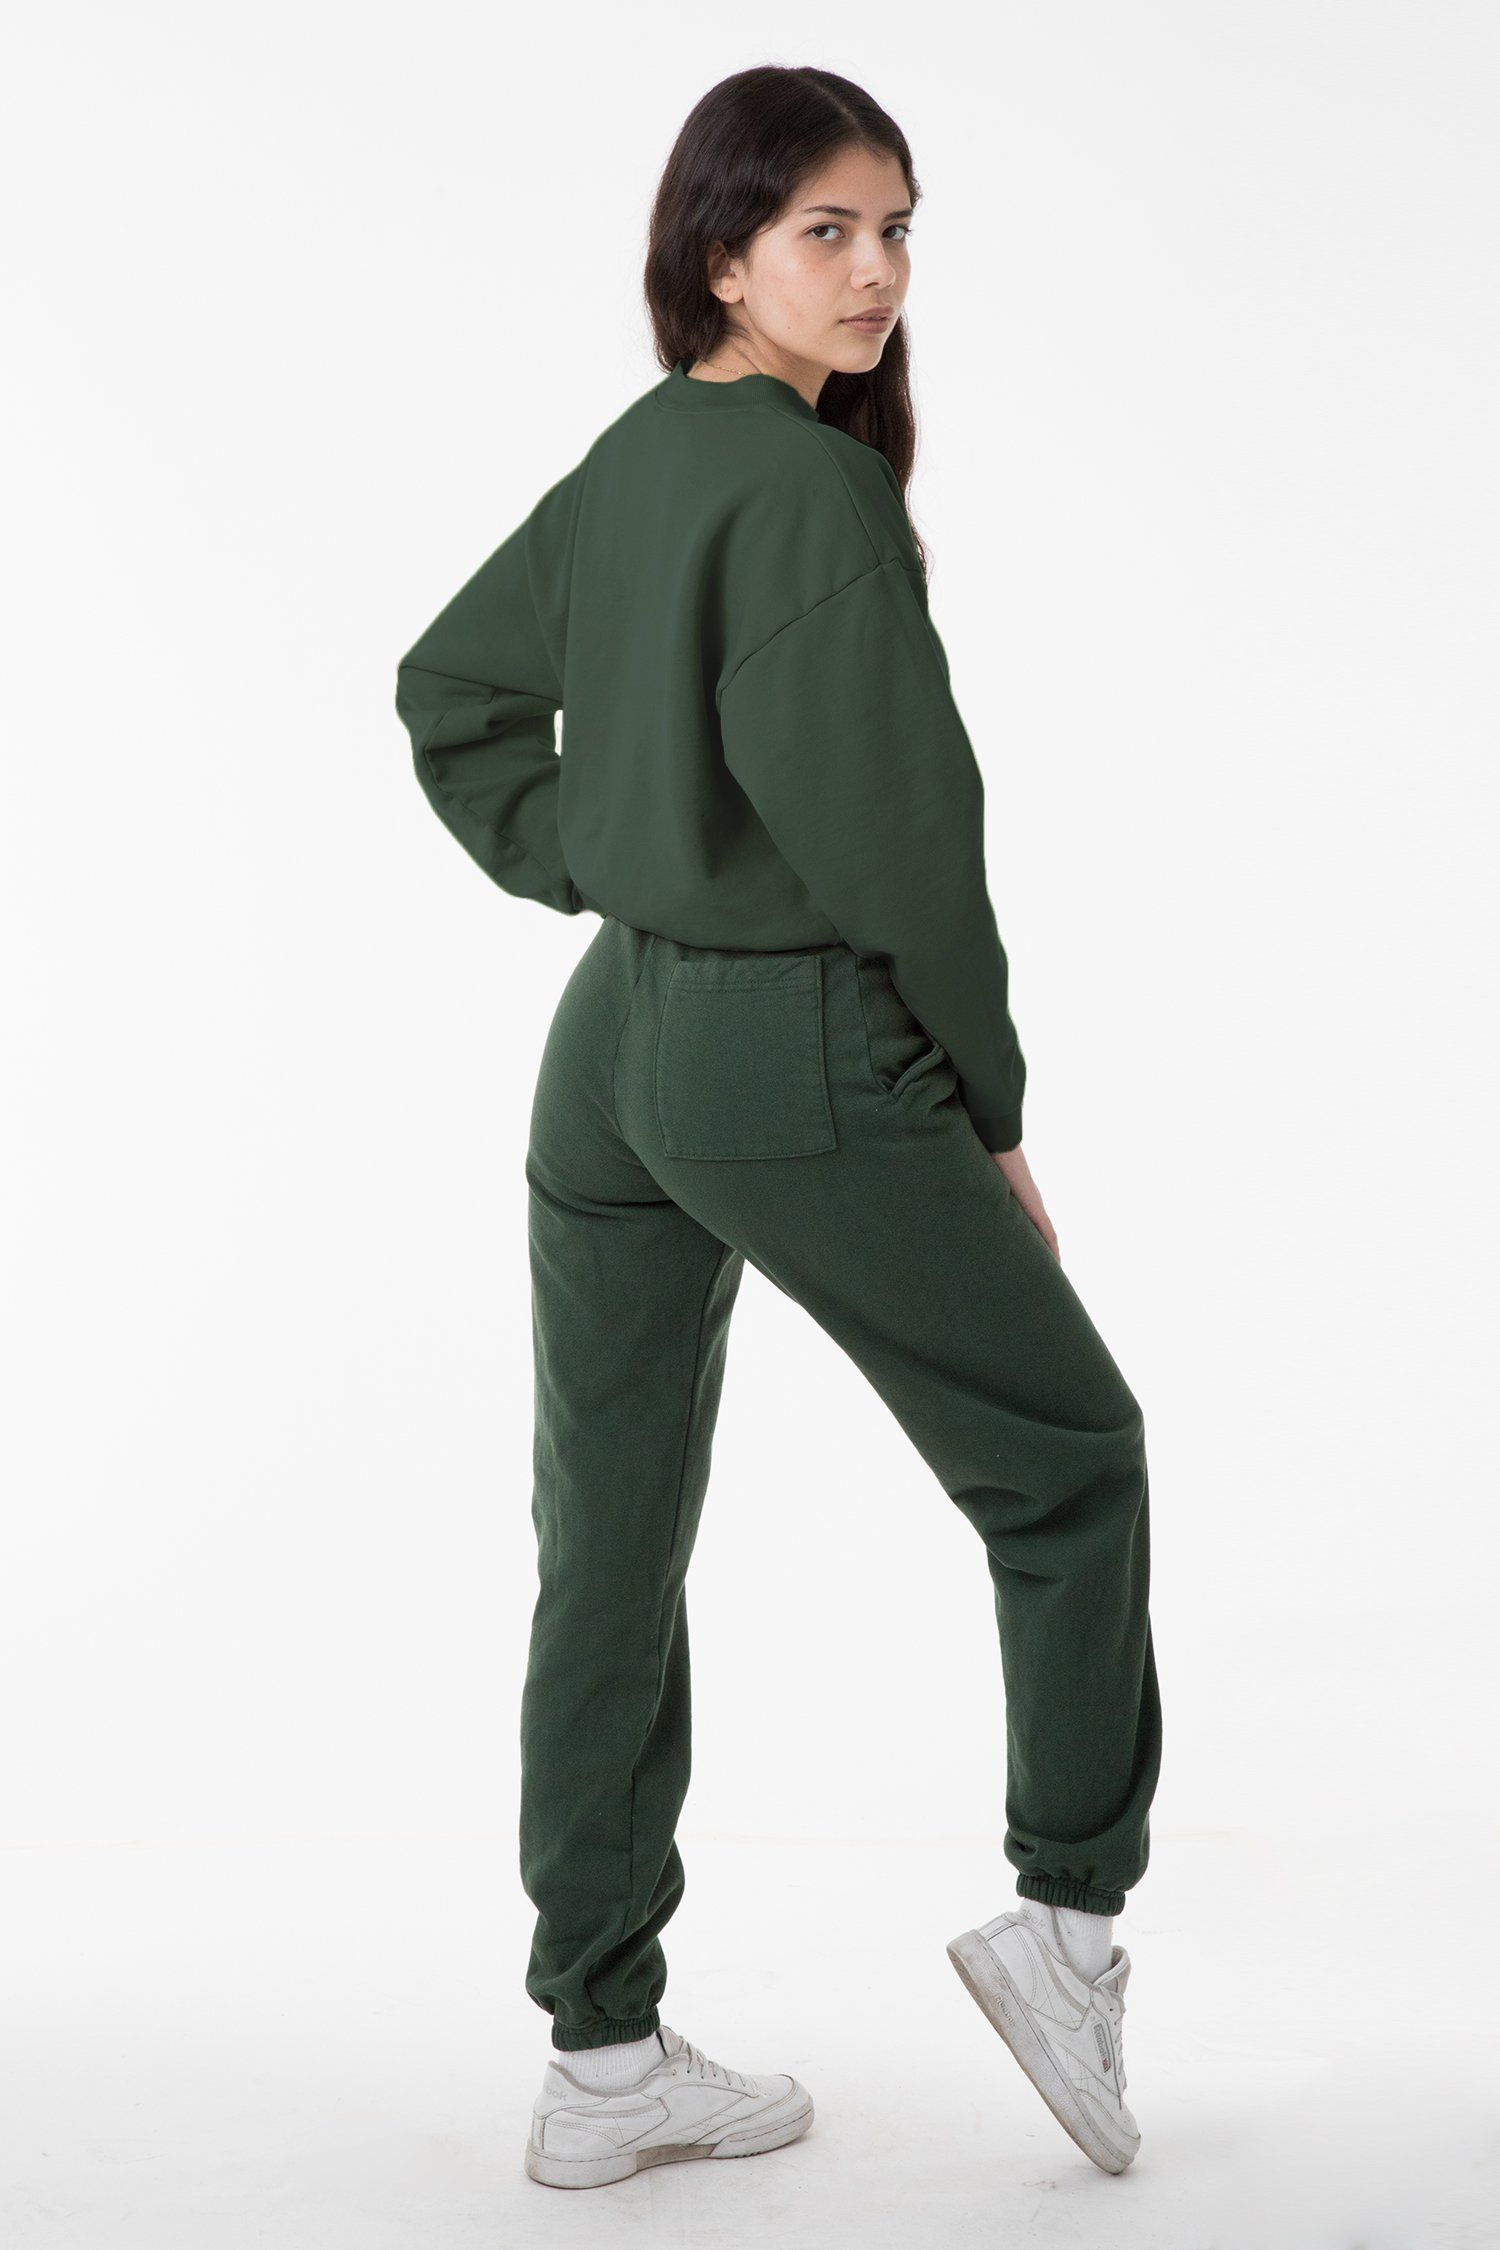 Hf04gd Unisex Garment Dye Heavy Fleece Sweatpant Garment Dye Garment Sweatpants